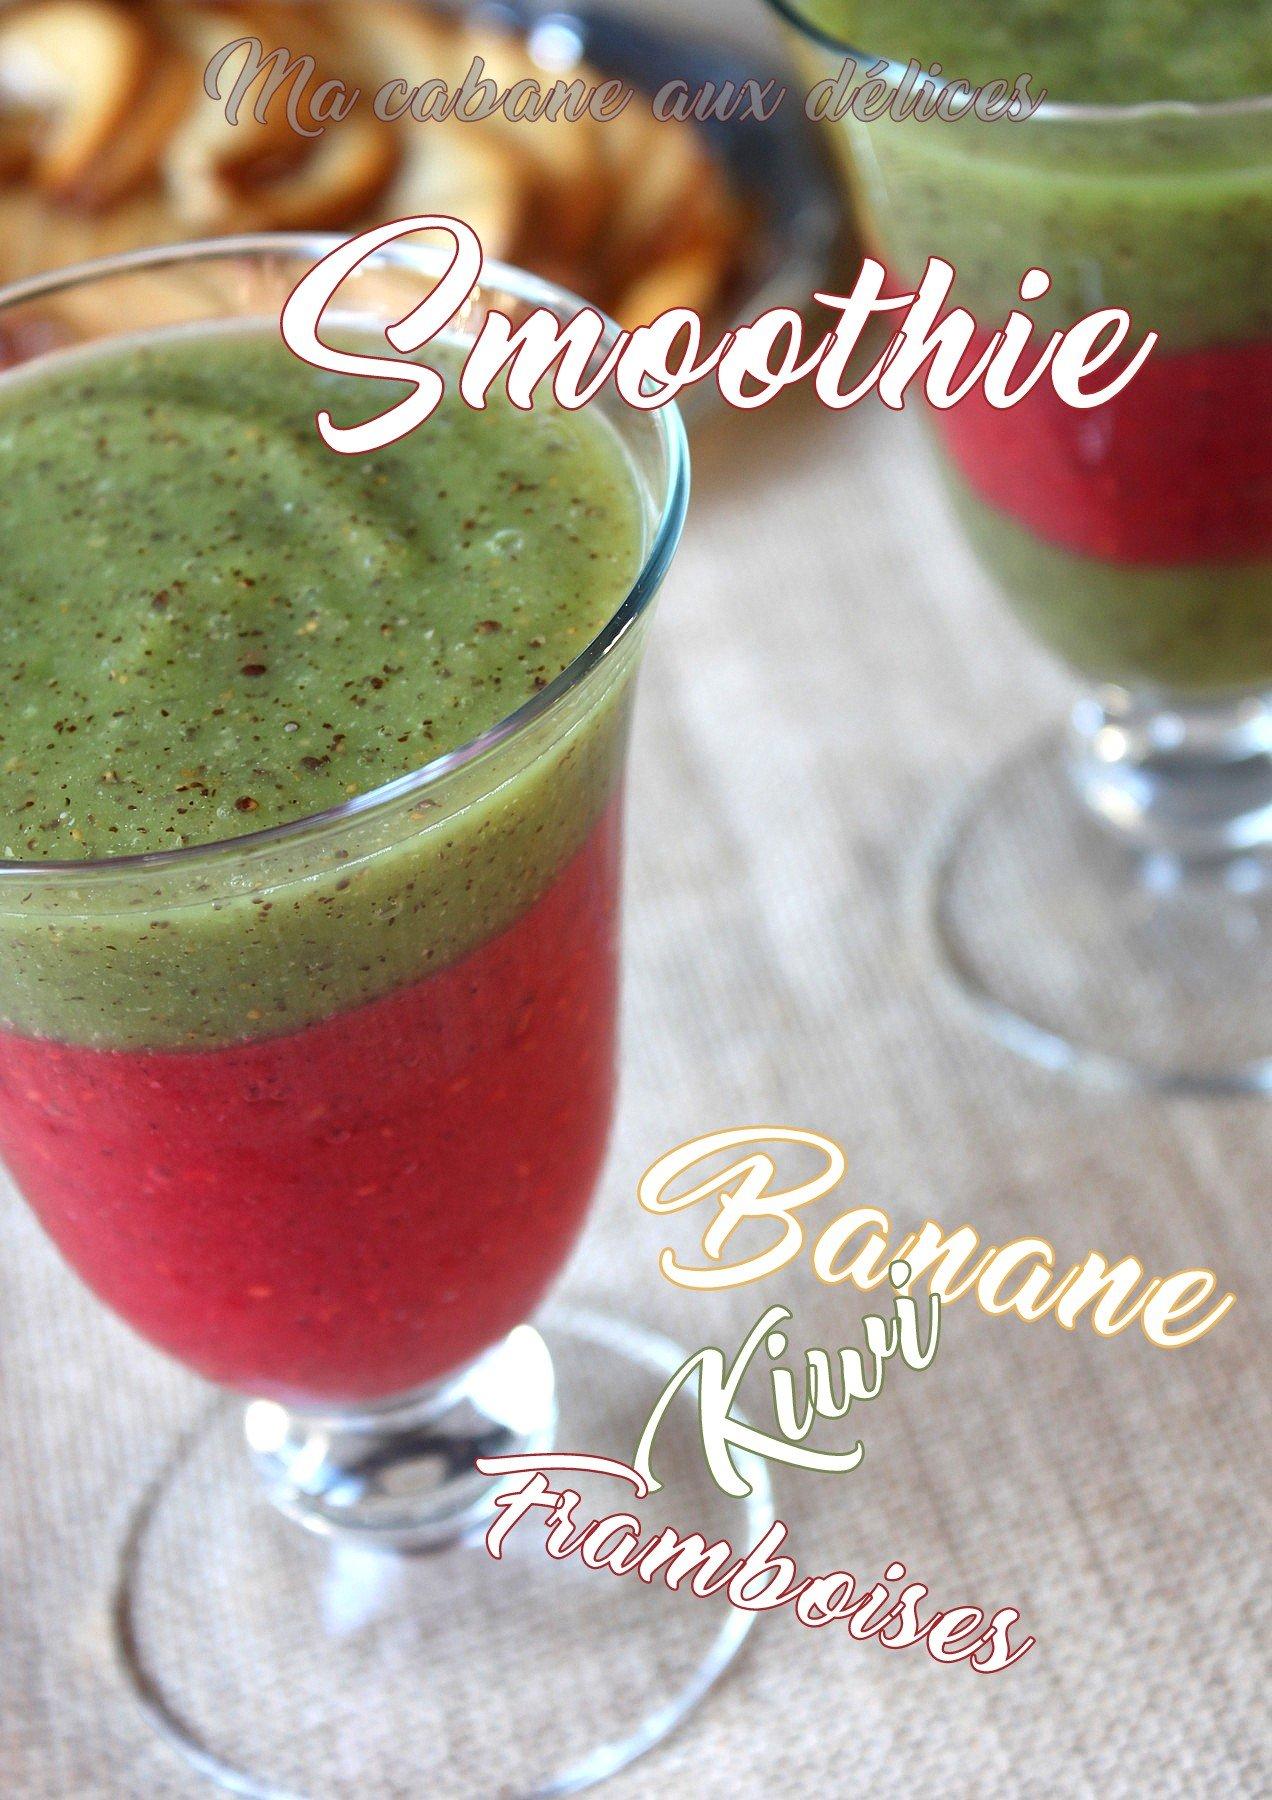 Recette smoothie au blender kiwi banane